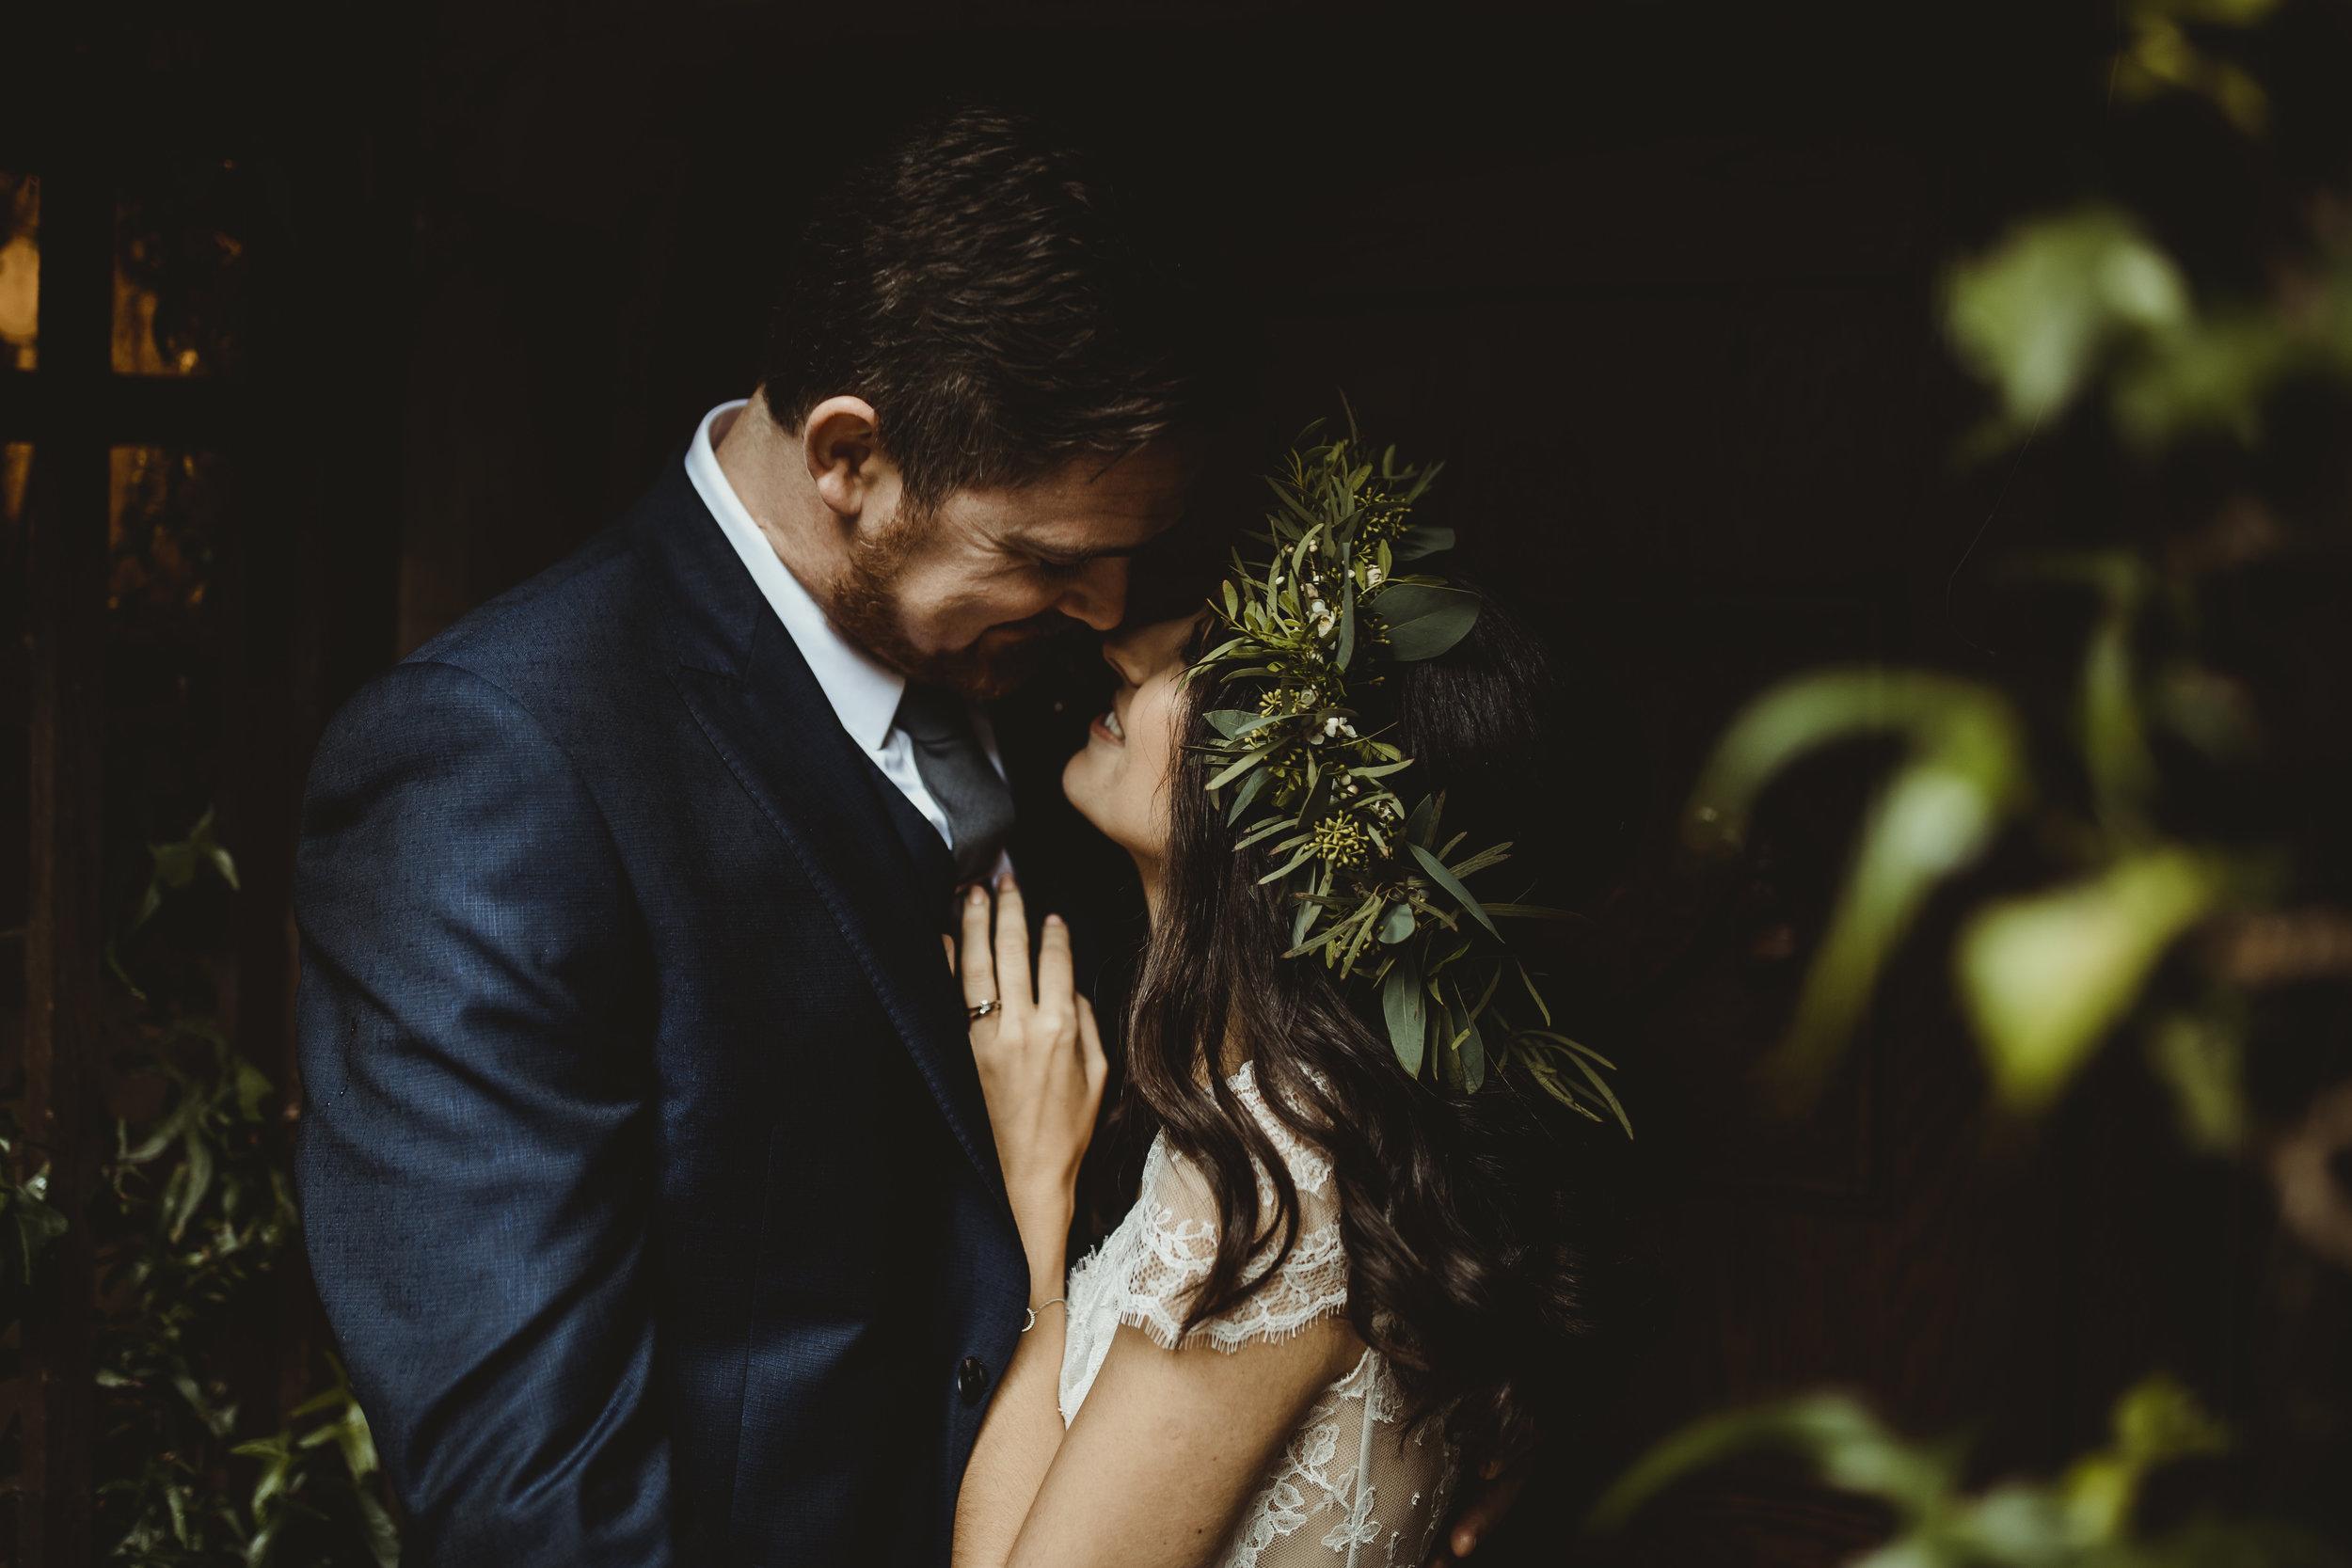 N&J_YORKSHIRE_WEDDING_PHOTOGRAPHER_MALTON_LEEDS_SHEFFIELD-592.JPG